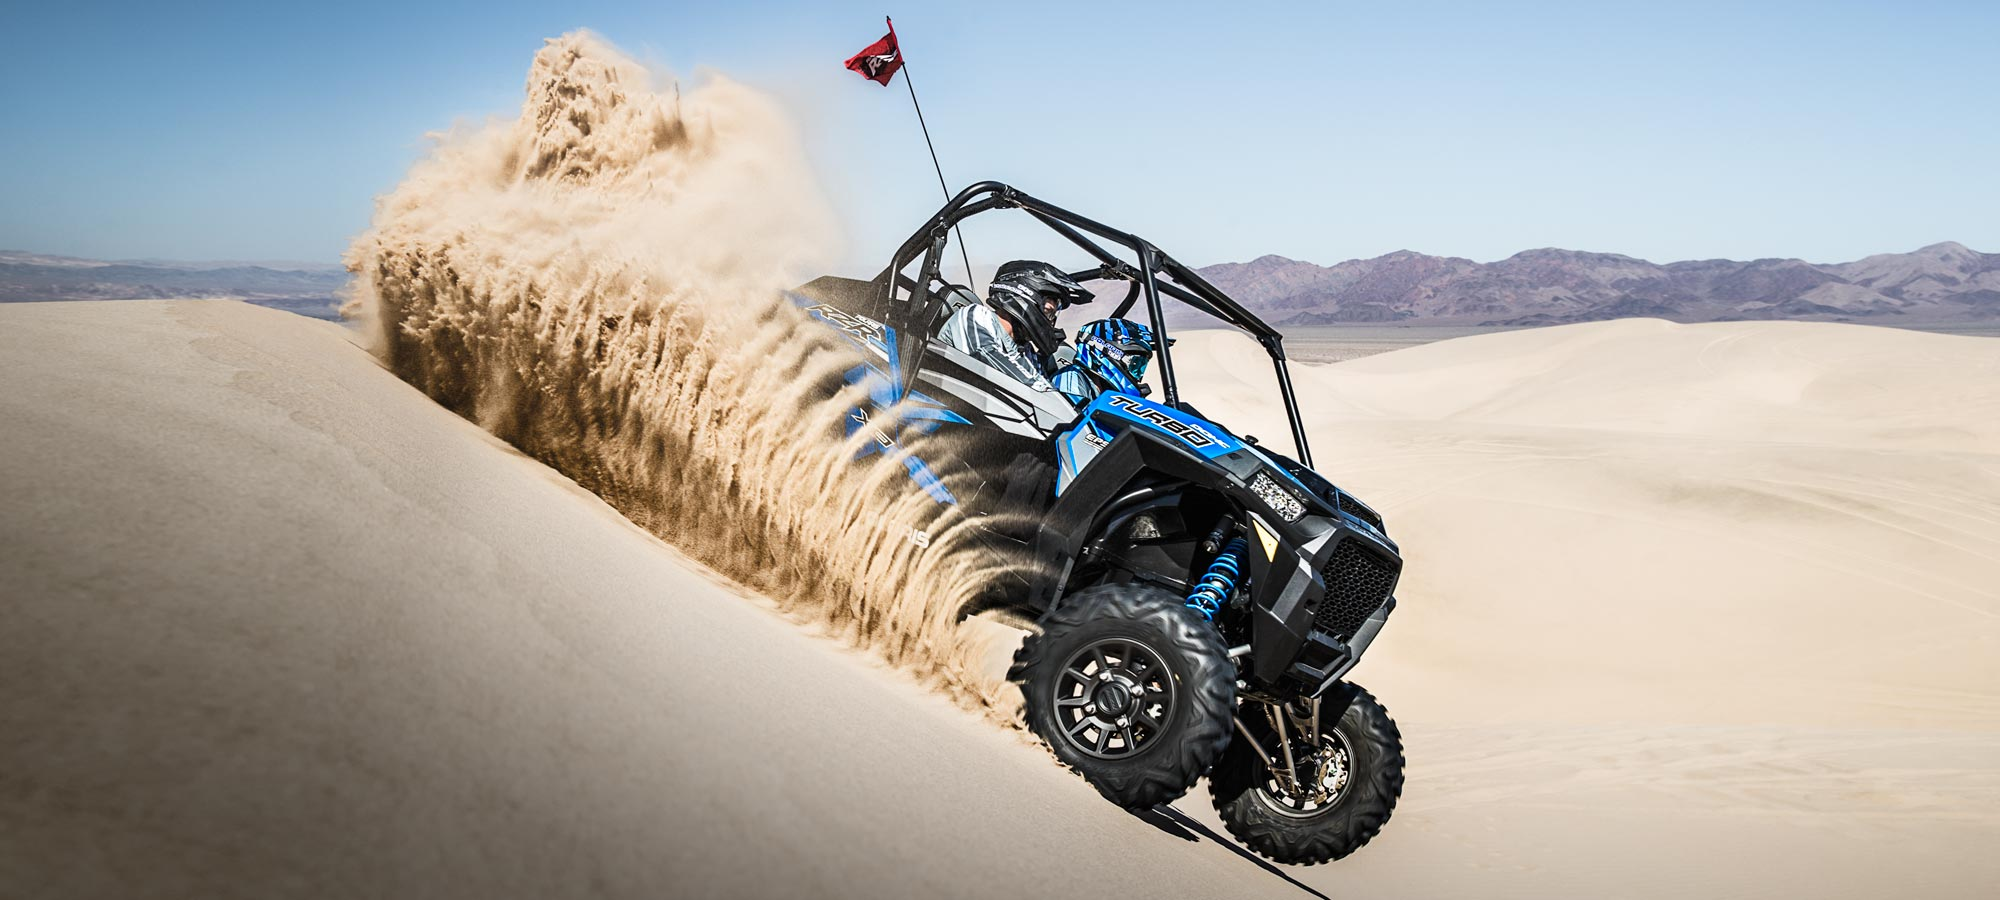 rzr-xp-turbo-blue